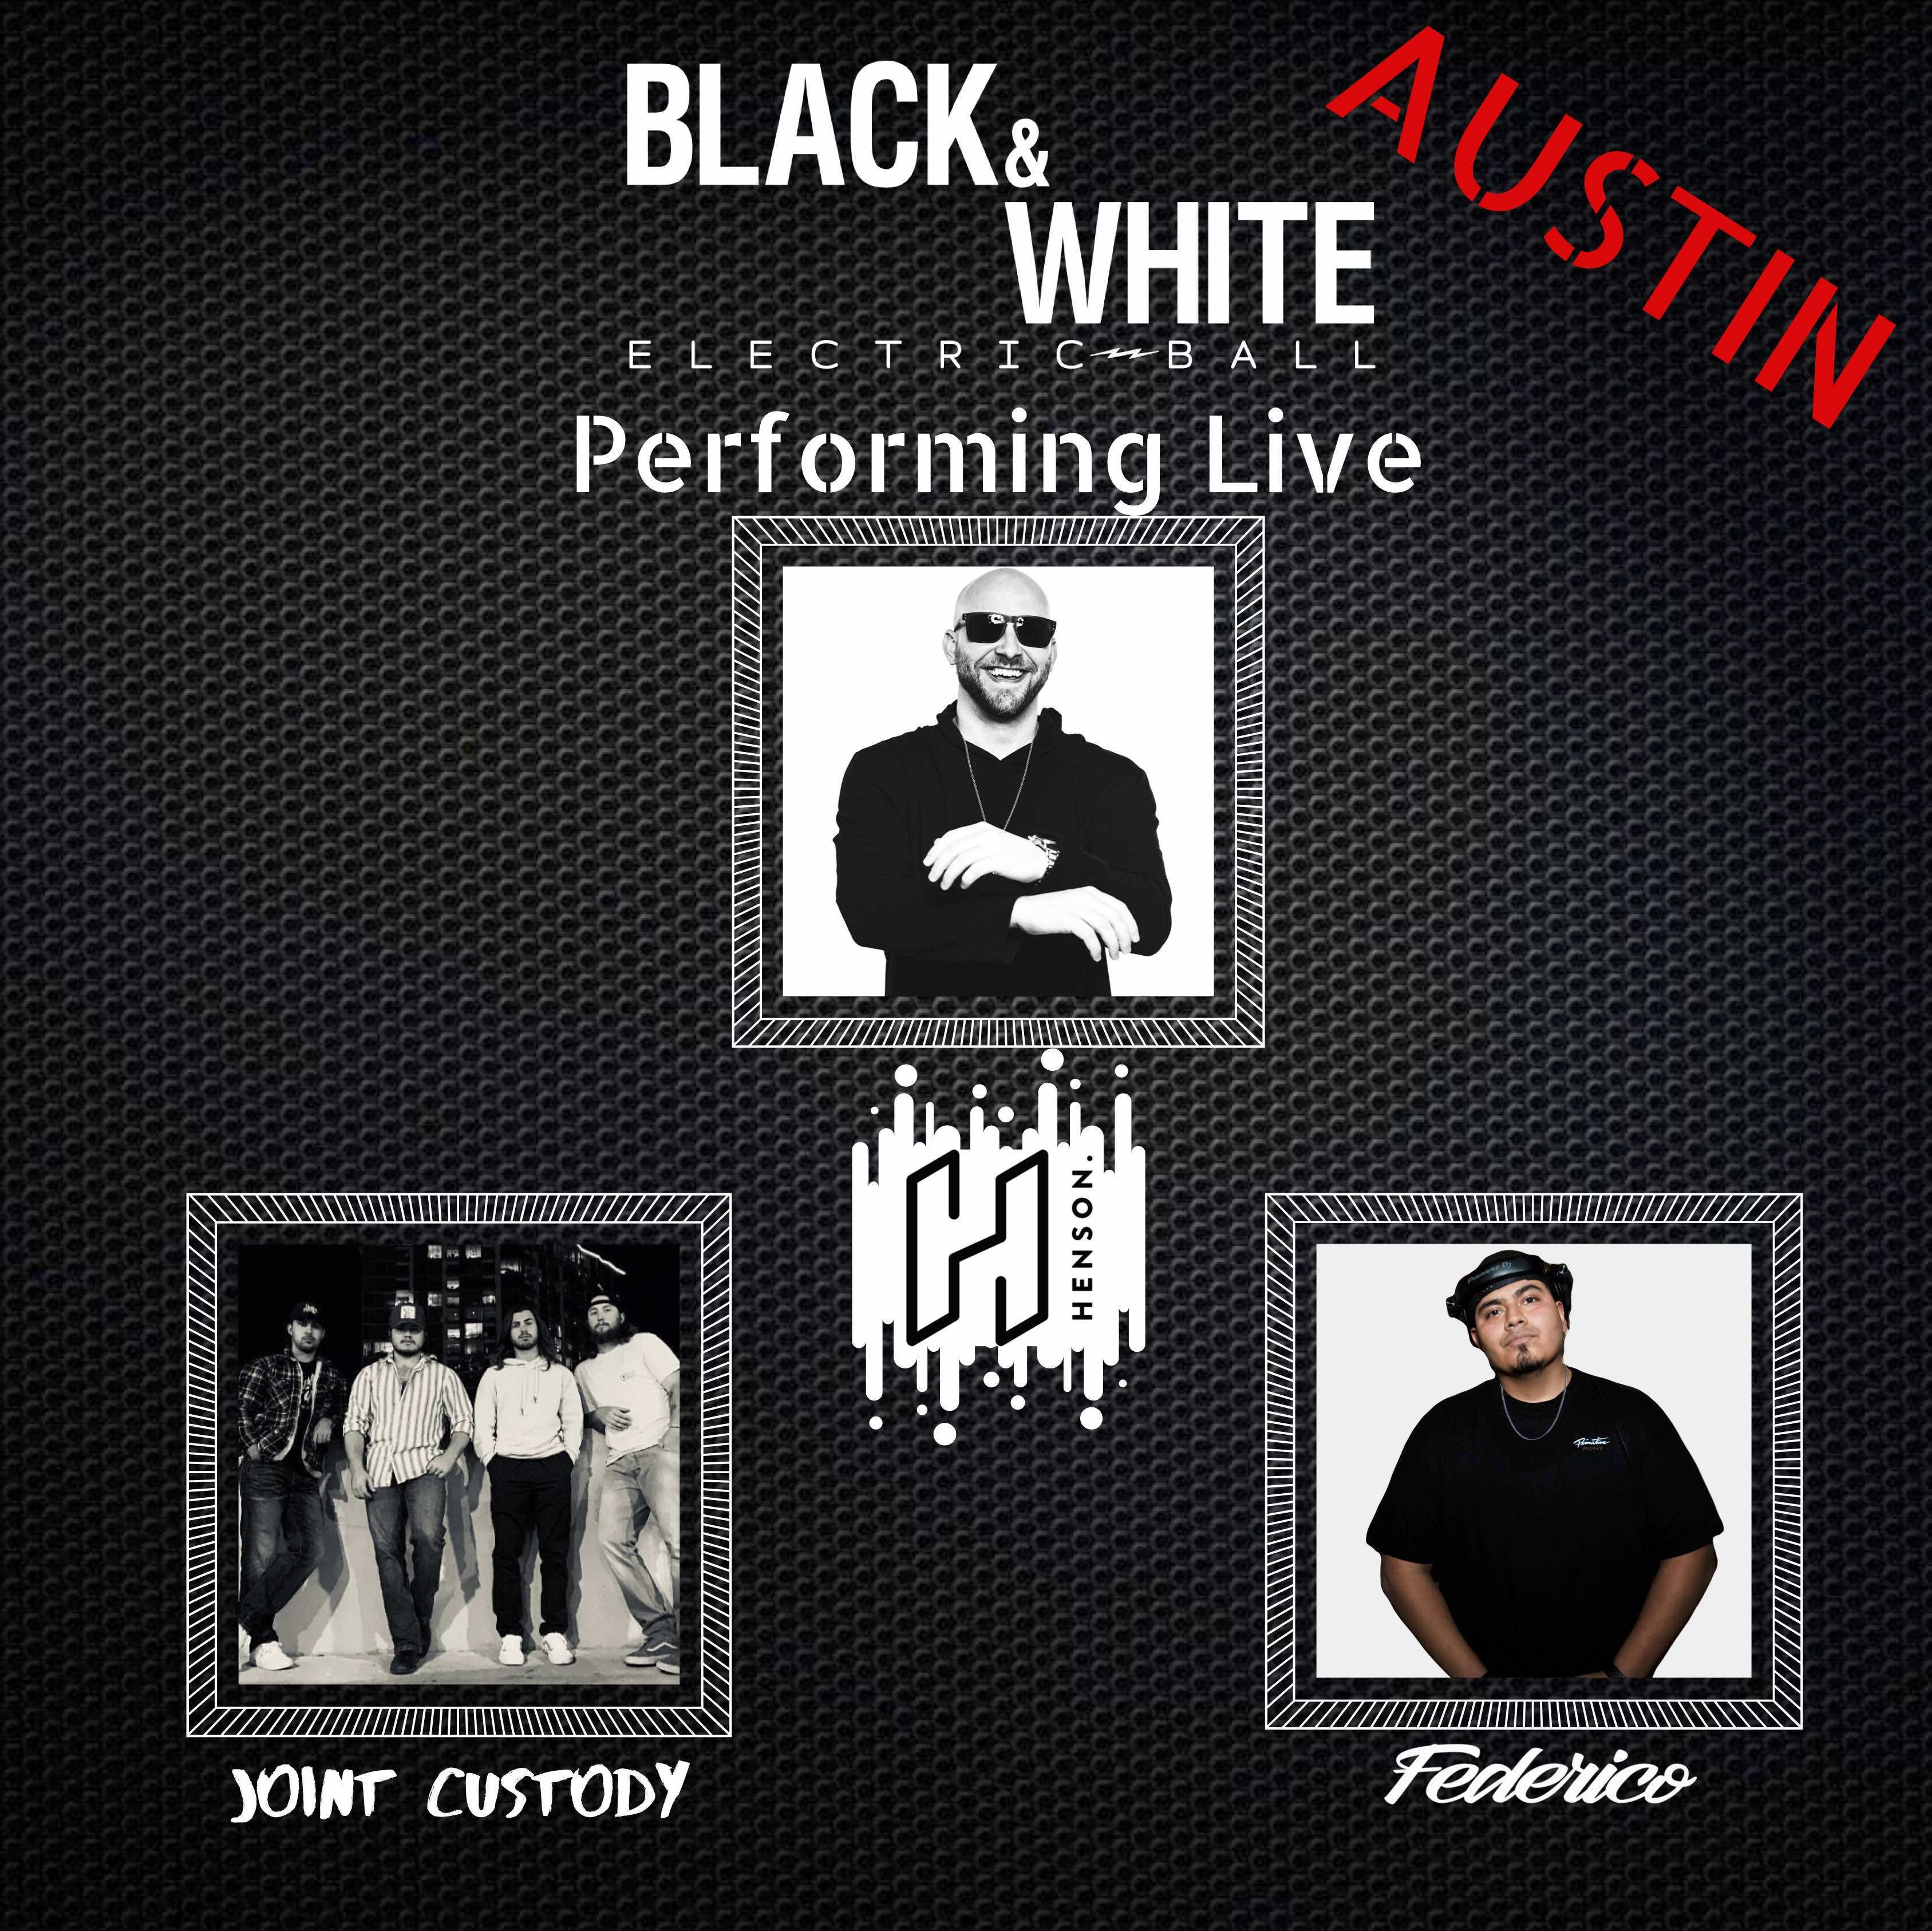 New Year's Eve Houston Austin Texas Hotel My VIP Life Party